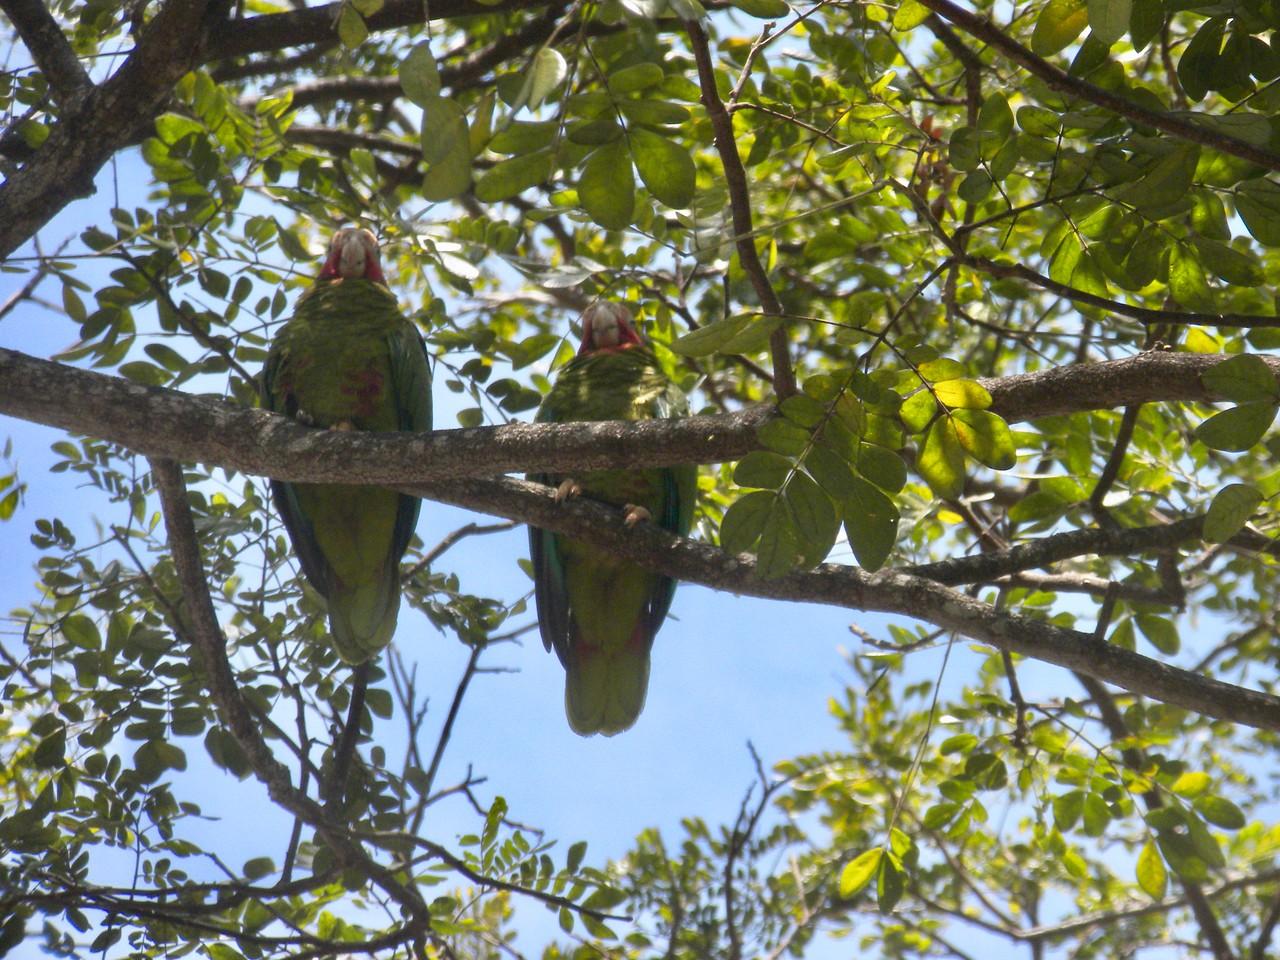 Cayman Parrot (Cuban Parrot)